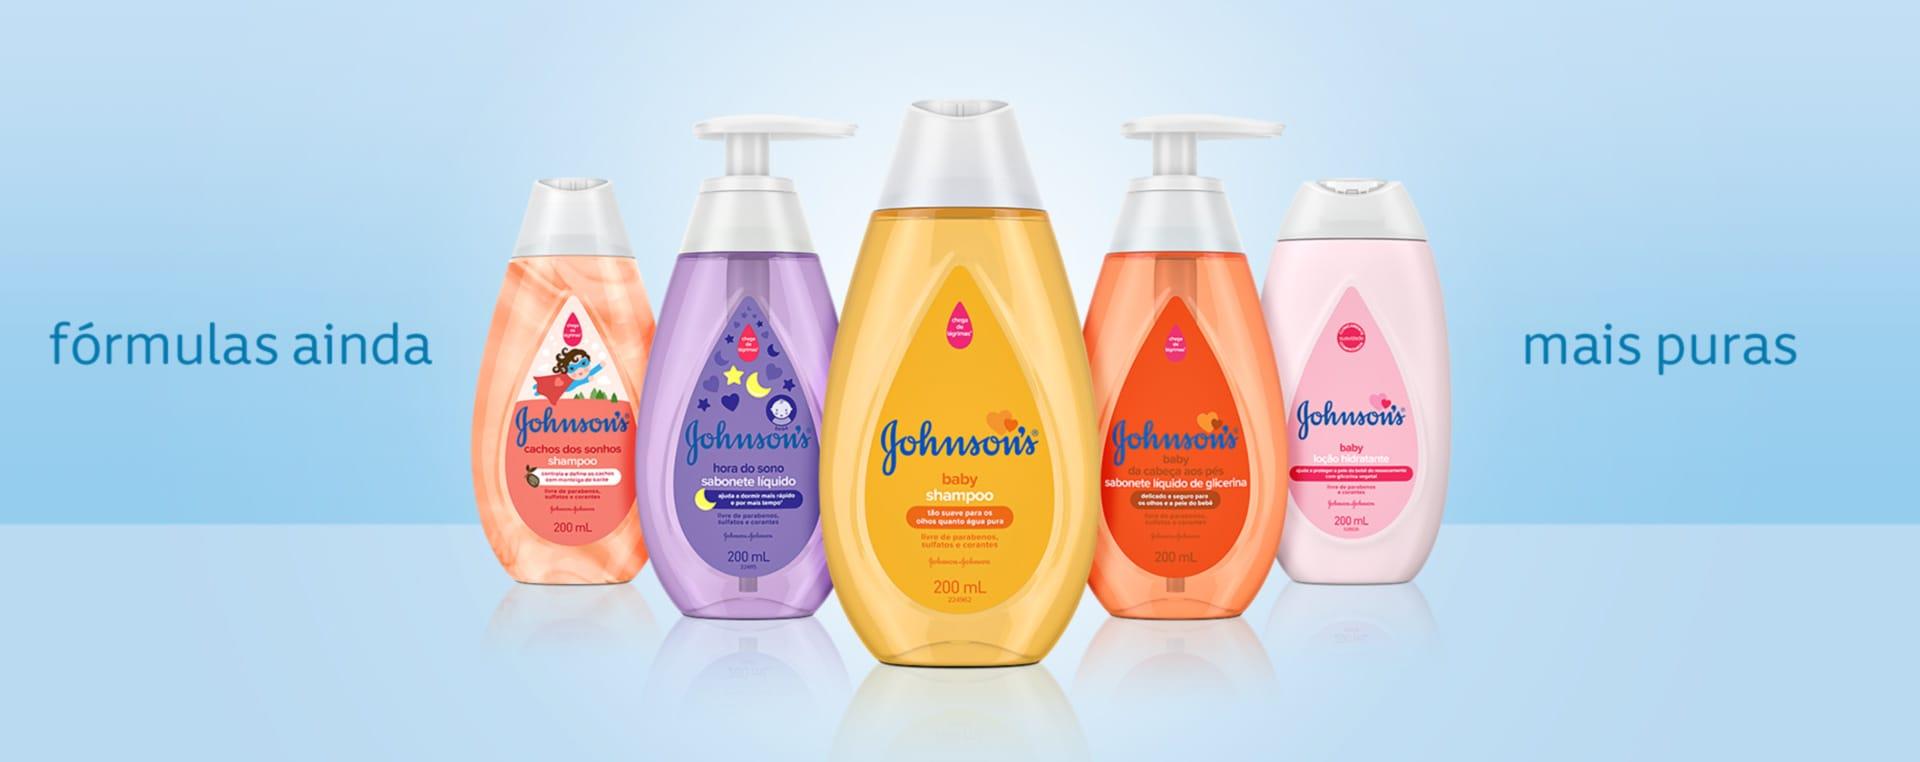 Produtos Jhonson's baby